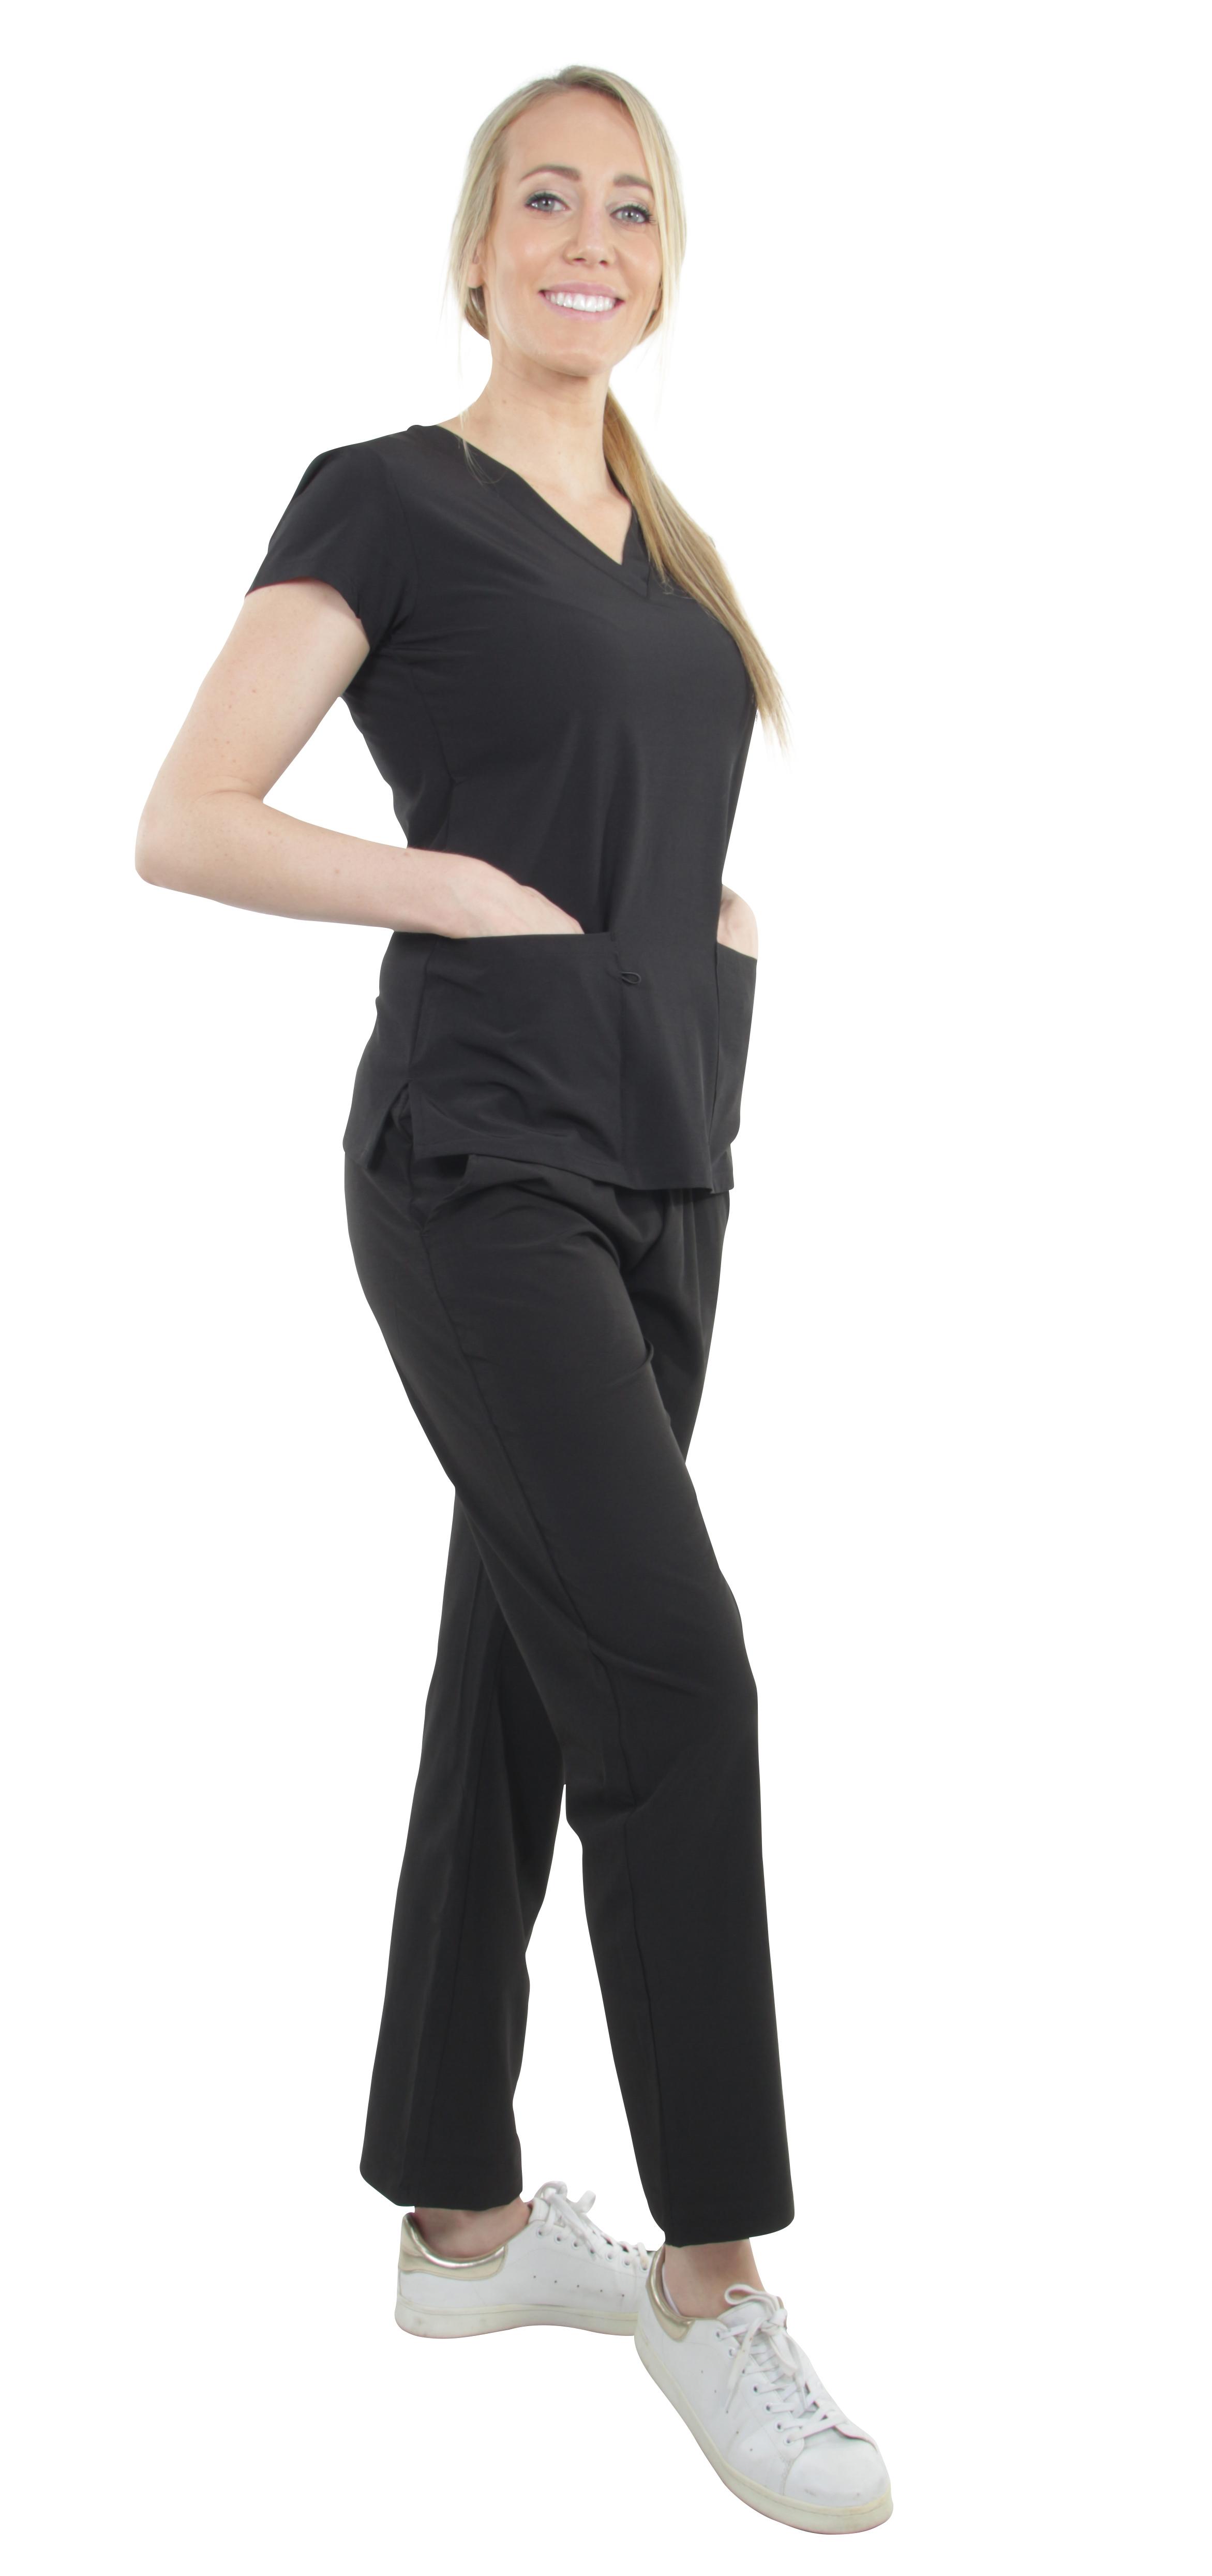 Unisex-Performance-Stretch-Medical-Uniform-Five-Pockets-V-Neck-Scrubs-Sets miniature 14